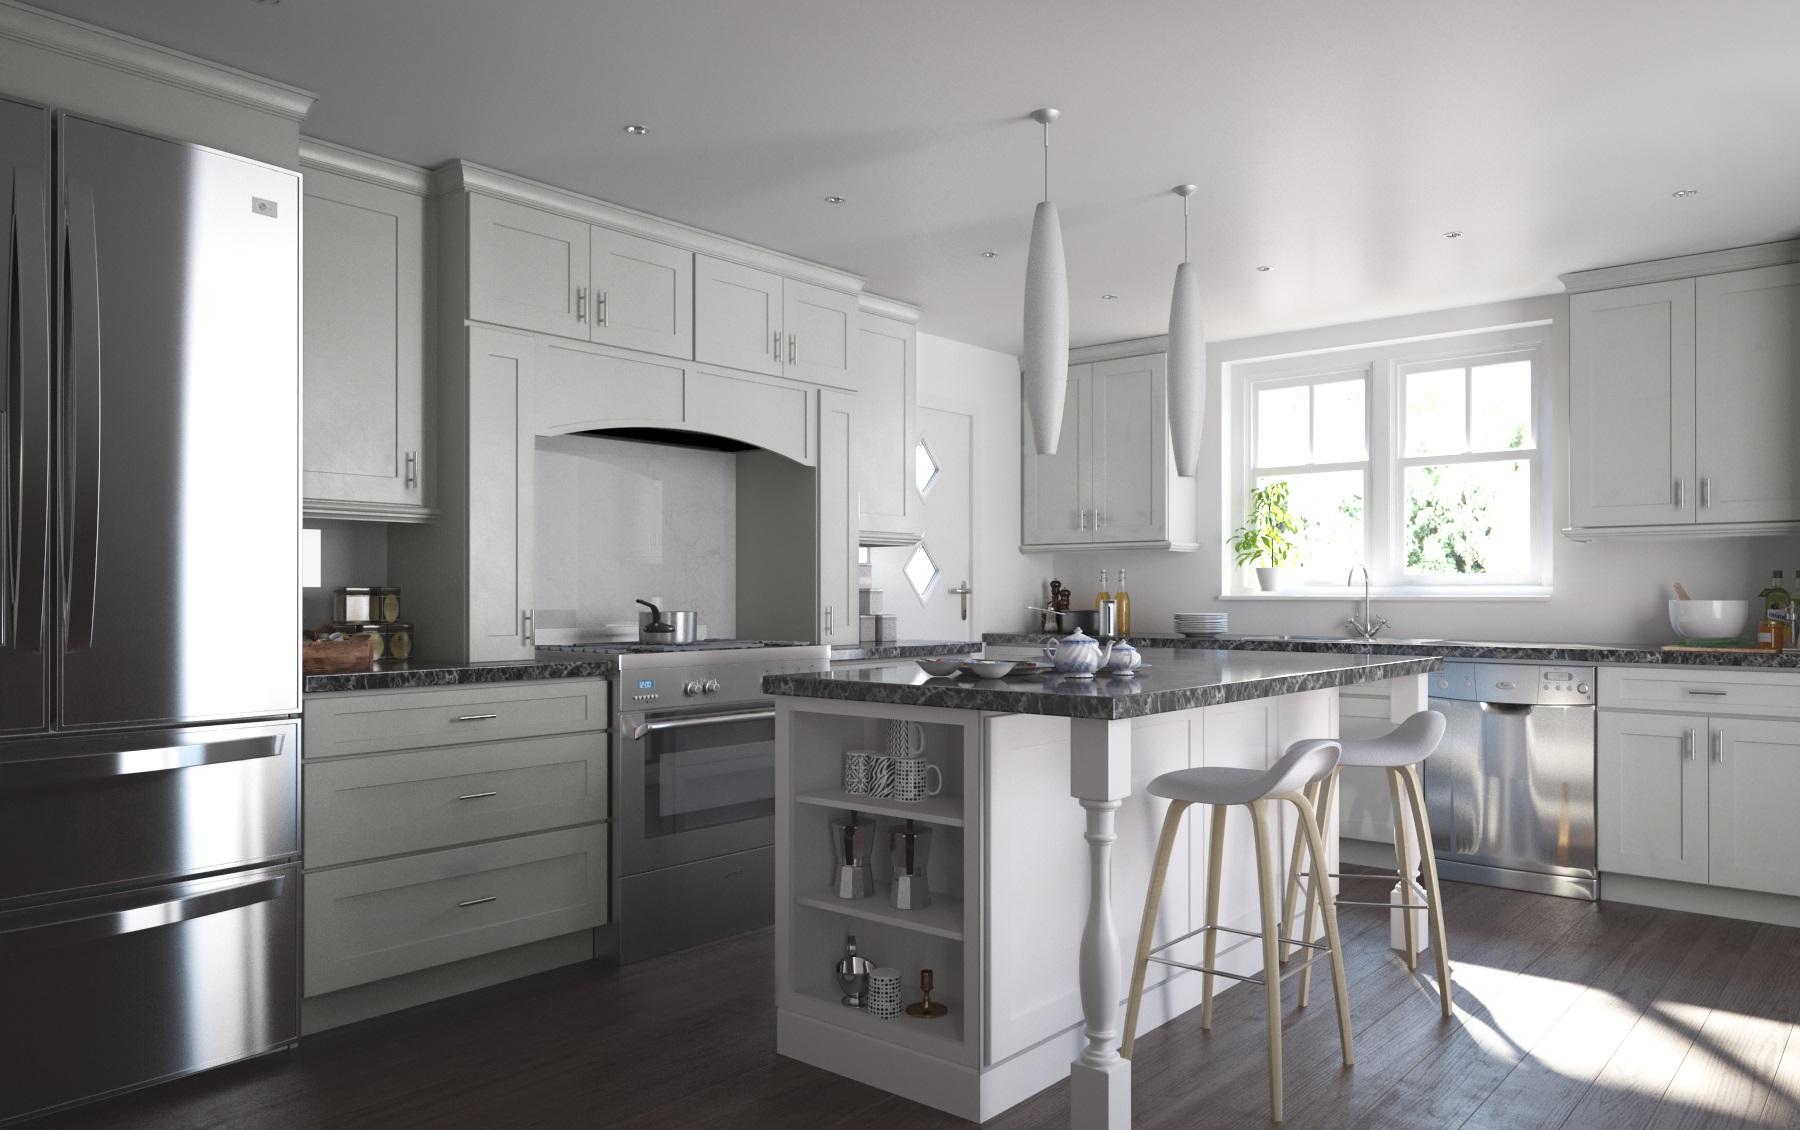 society shaker dove gray assembled kitchen cabinets Pre Assembled Kitchen Cabinets Society Shaker Dove Gray